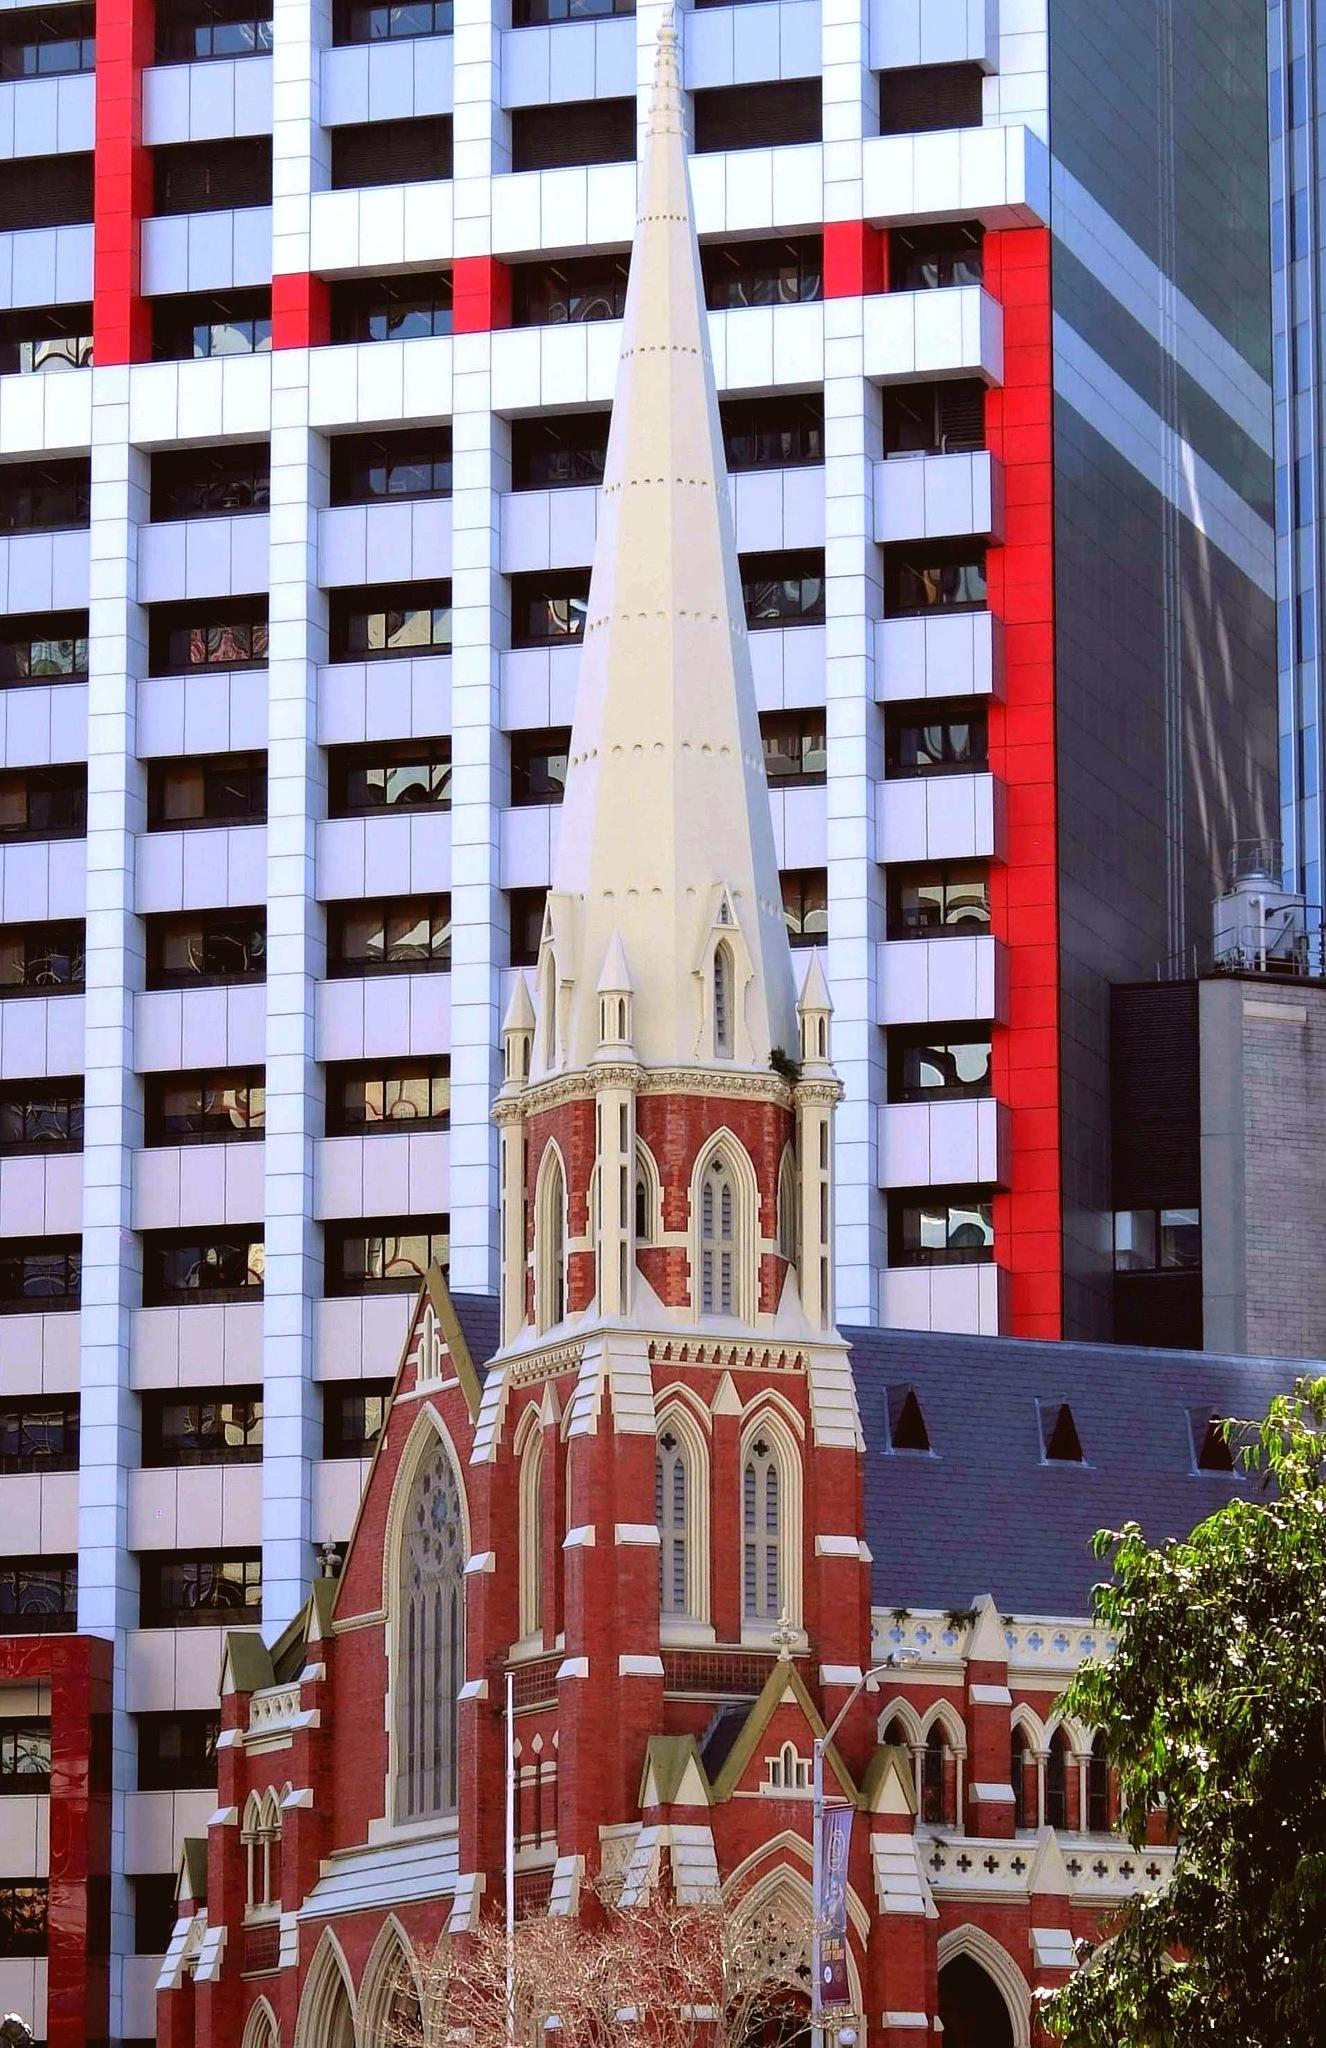 Brisbane city buildings-4 by pop88123